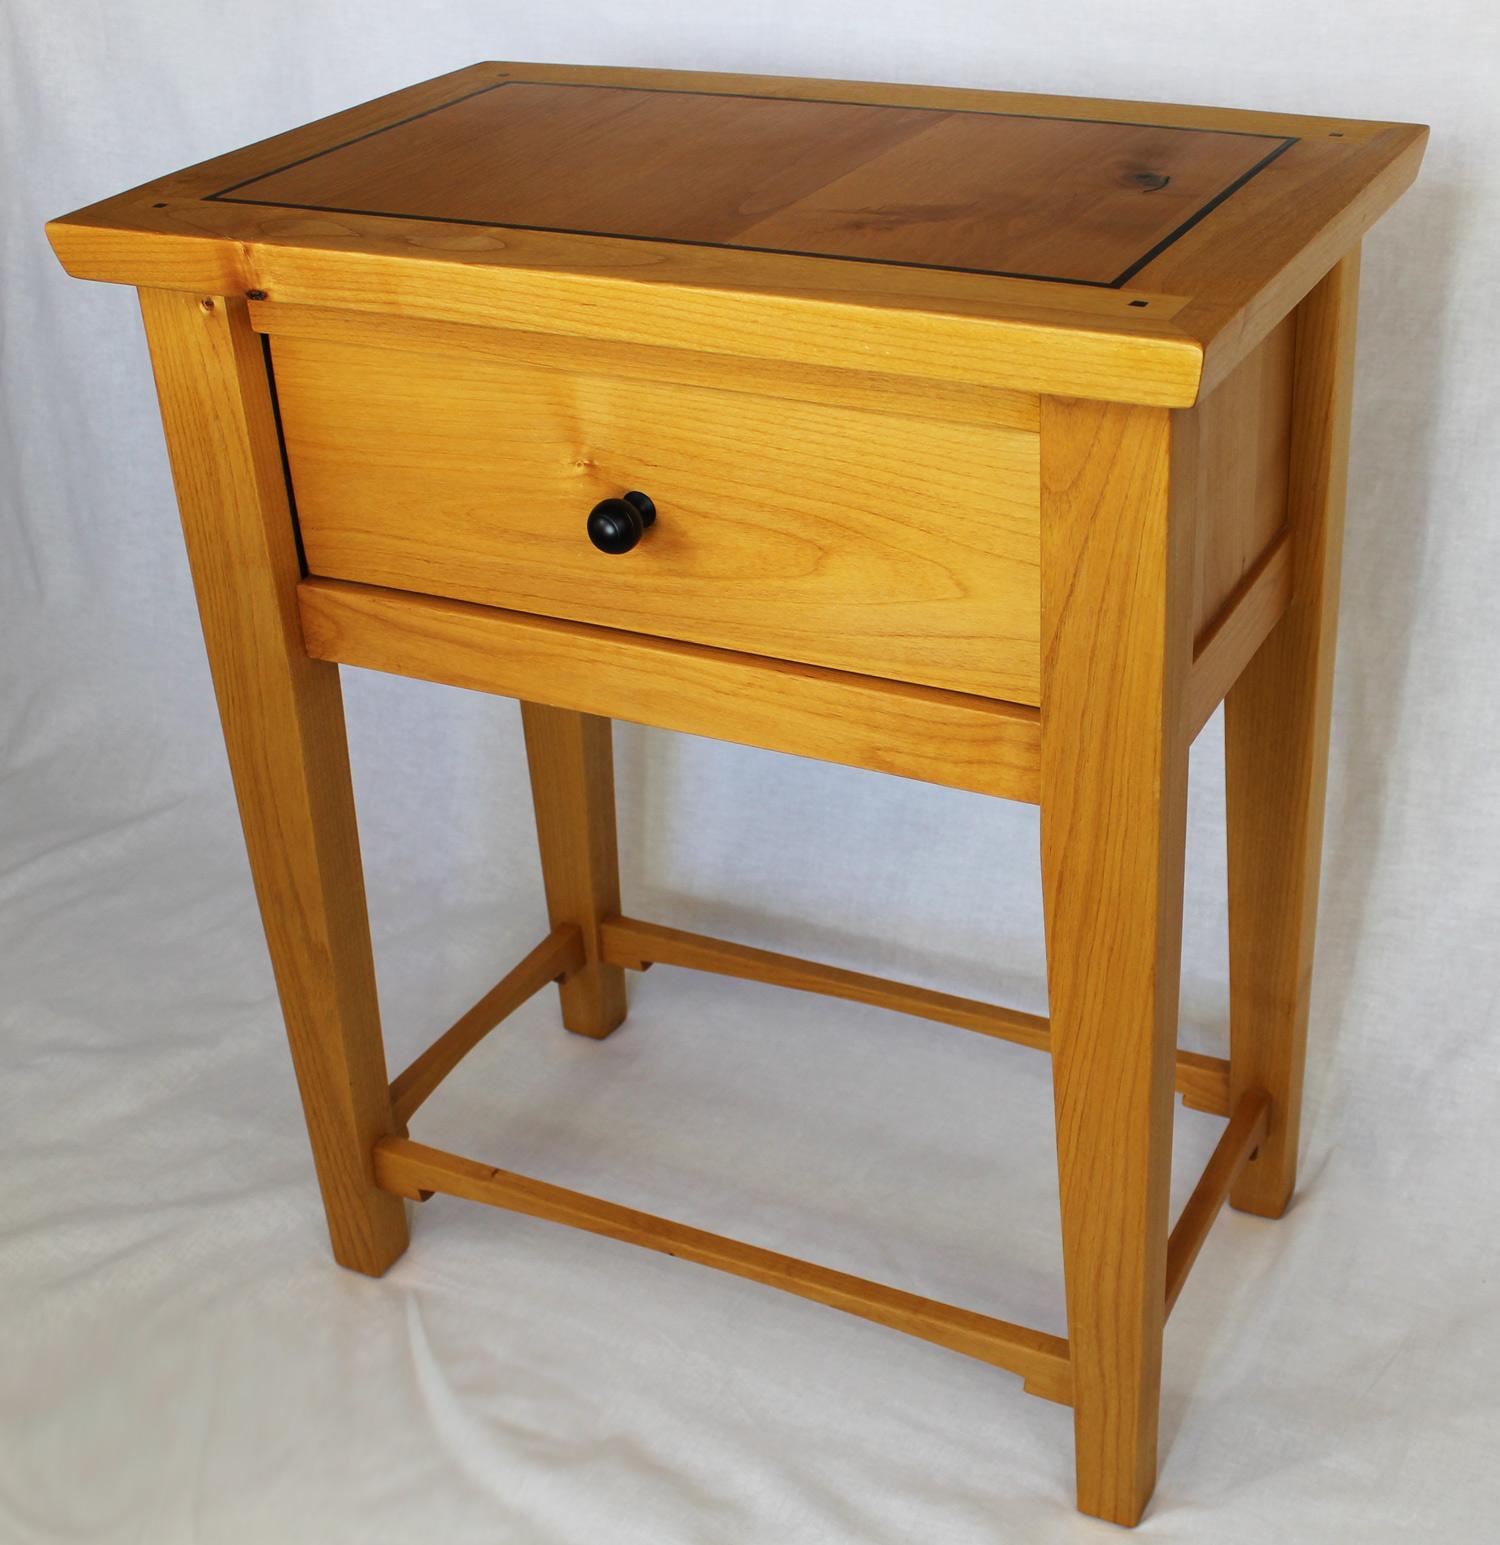 37_table_kanetsugi_end_1_img_1852.jpg